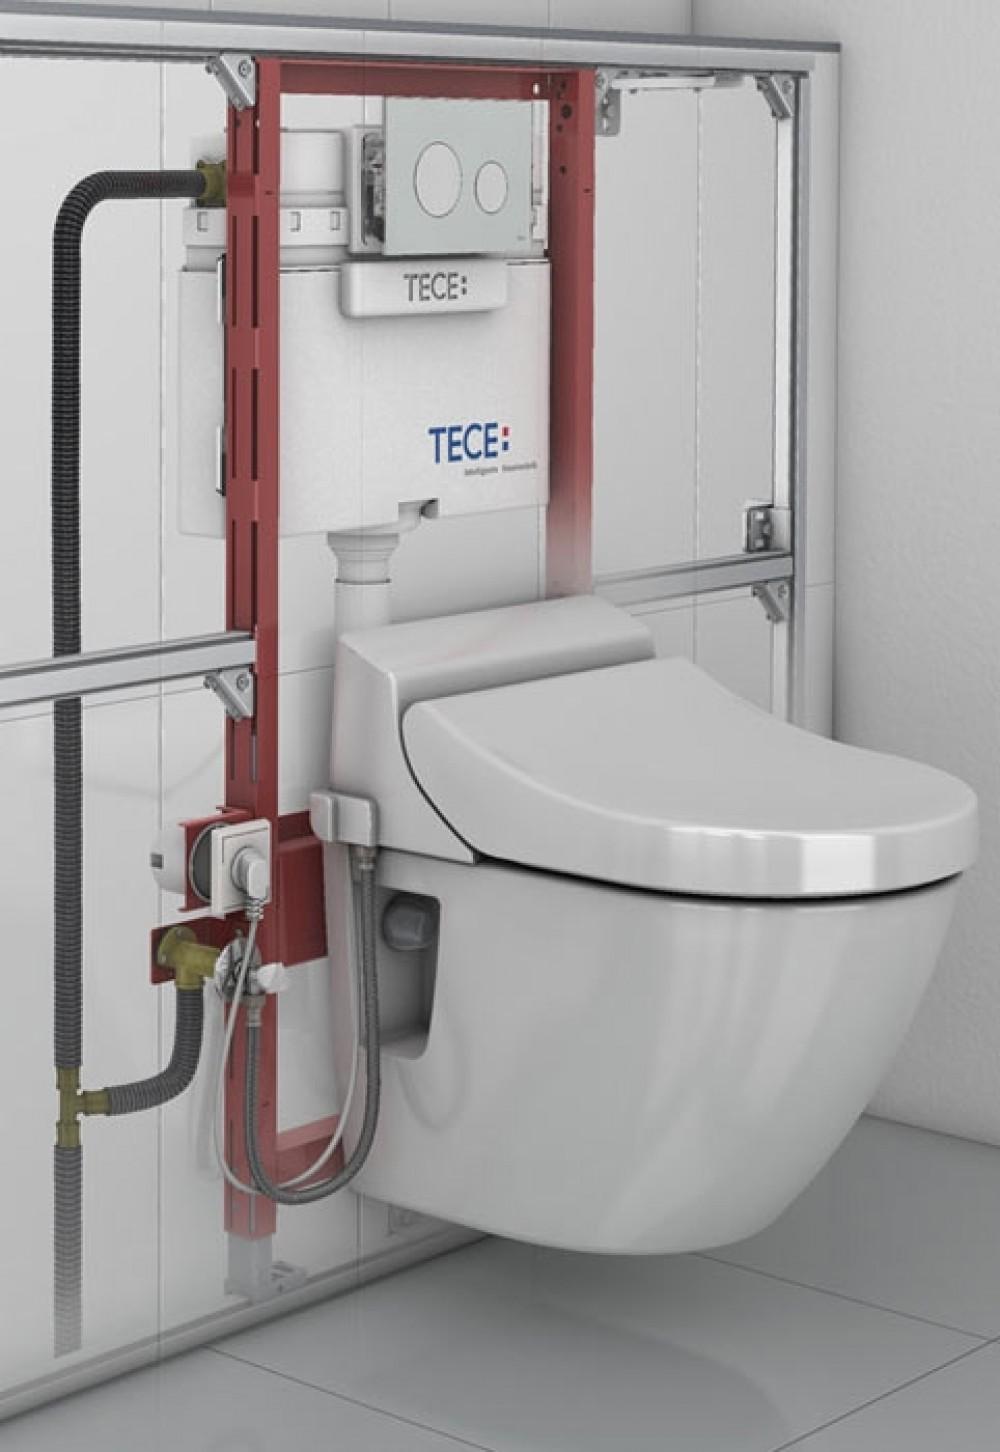 installation ek 2.0 washlet tece kombination